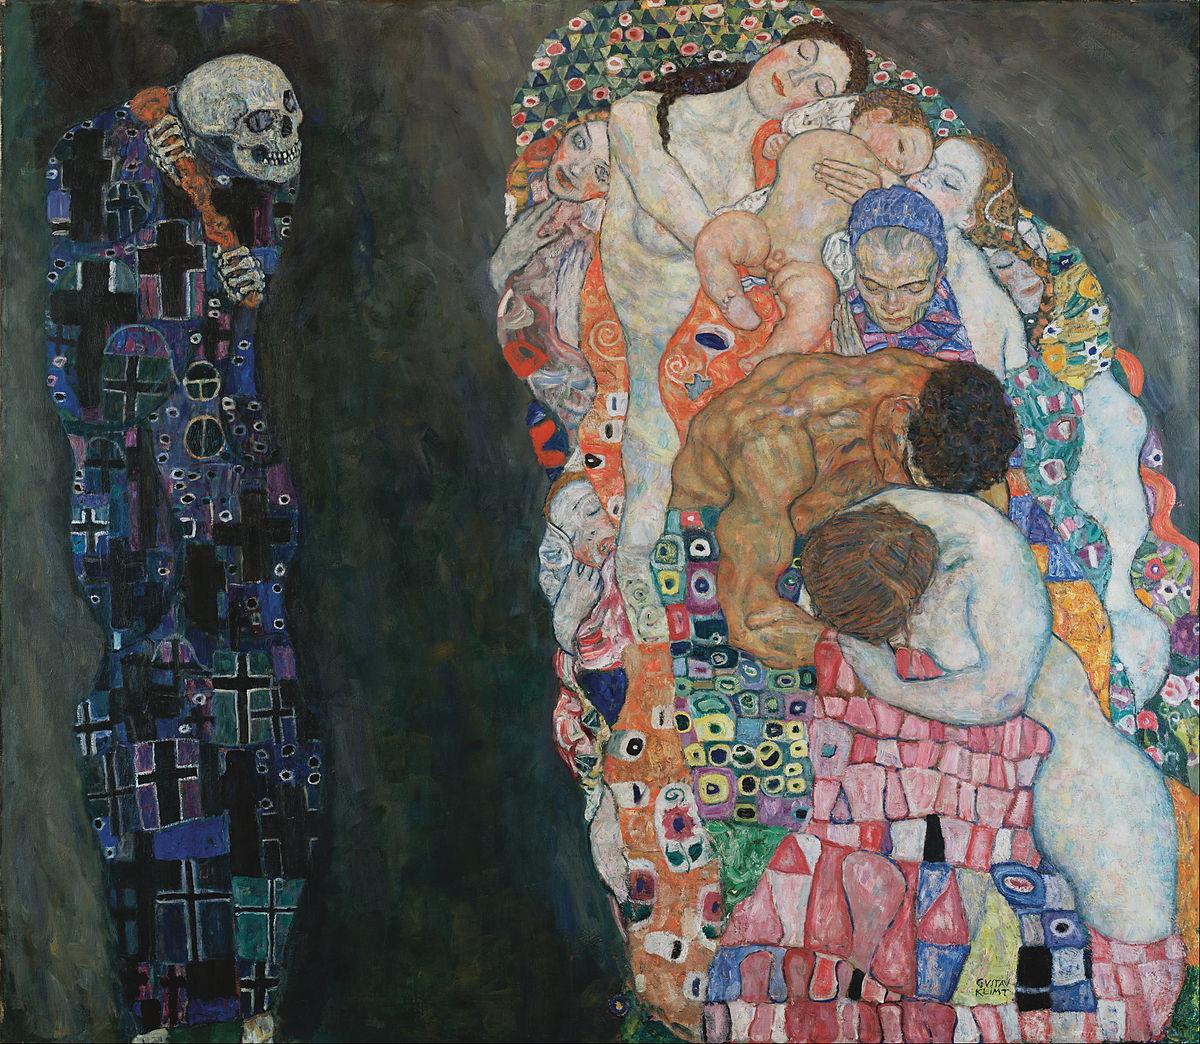 Gustav Klimt, Death and Life, 1908-1915